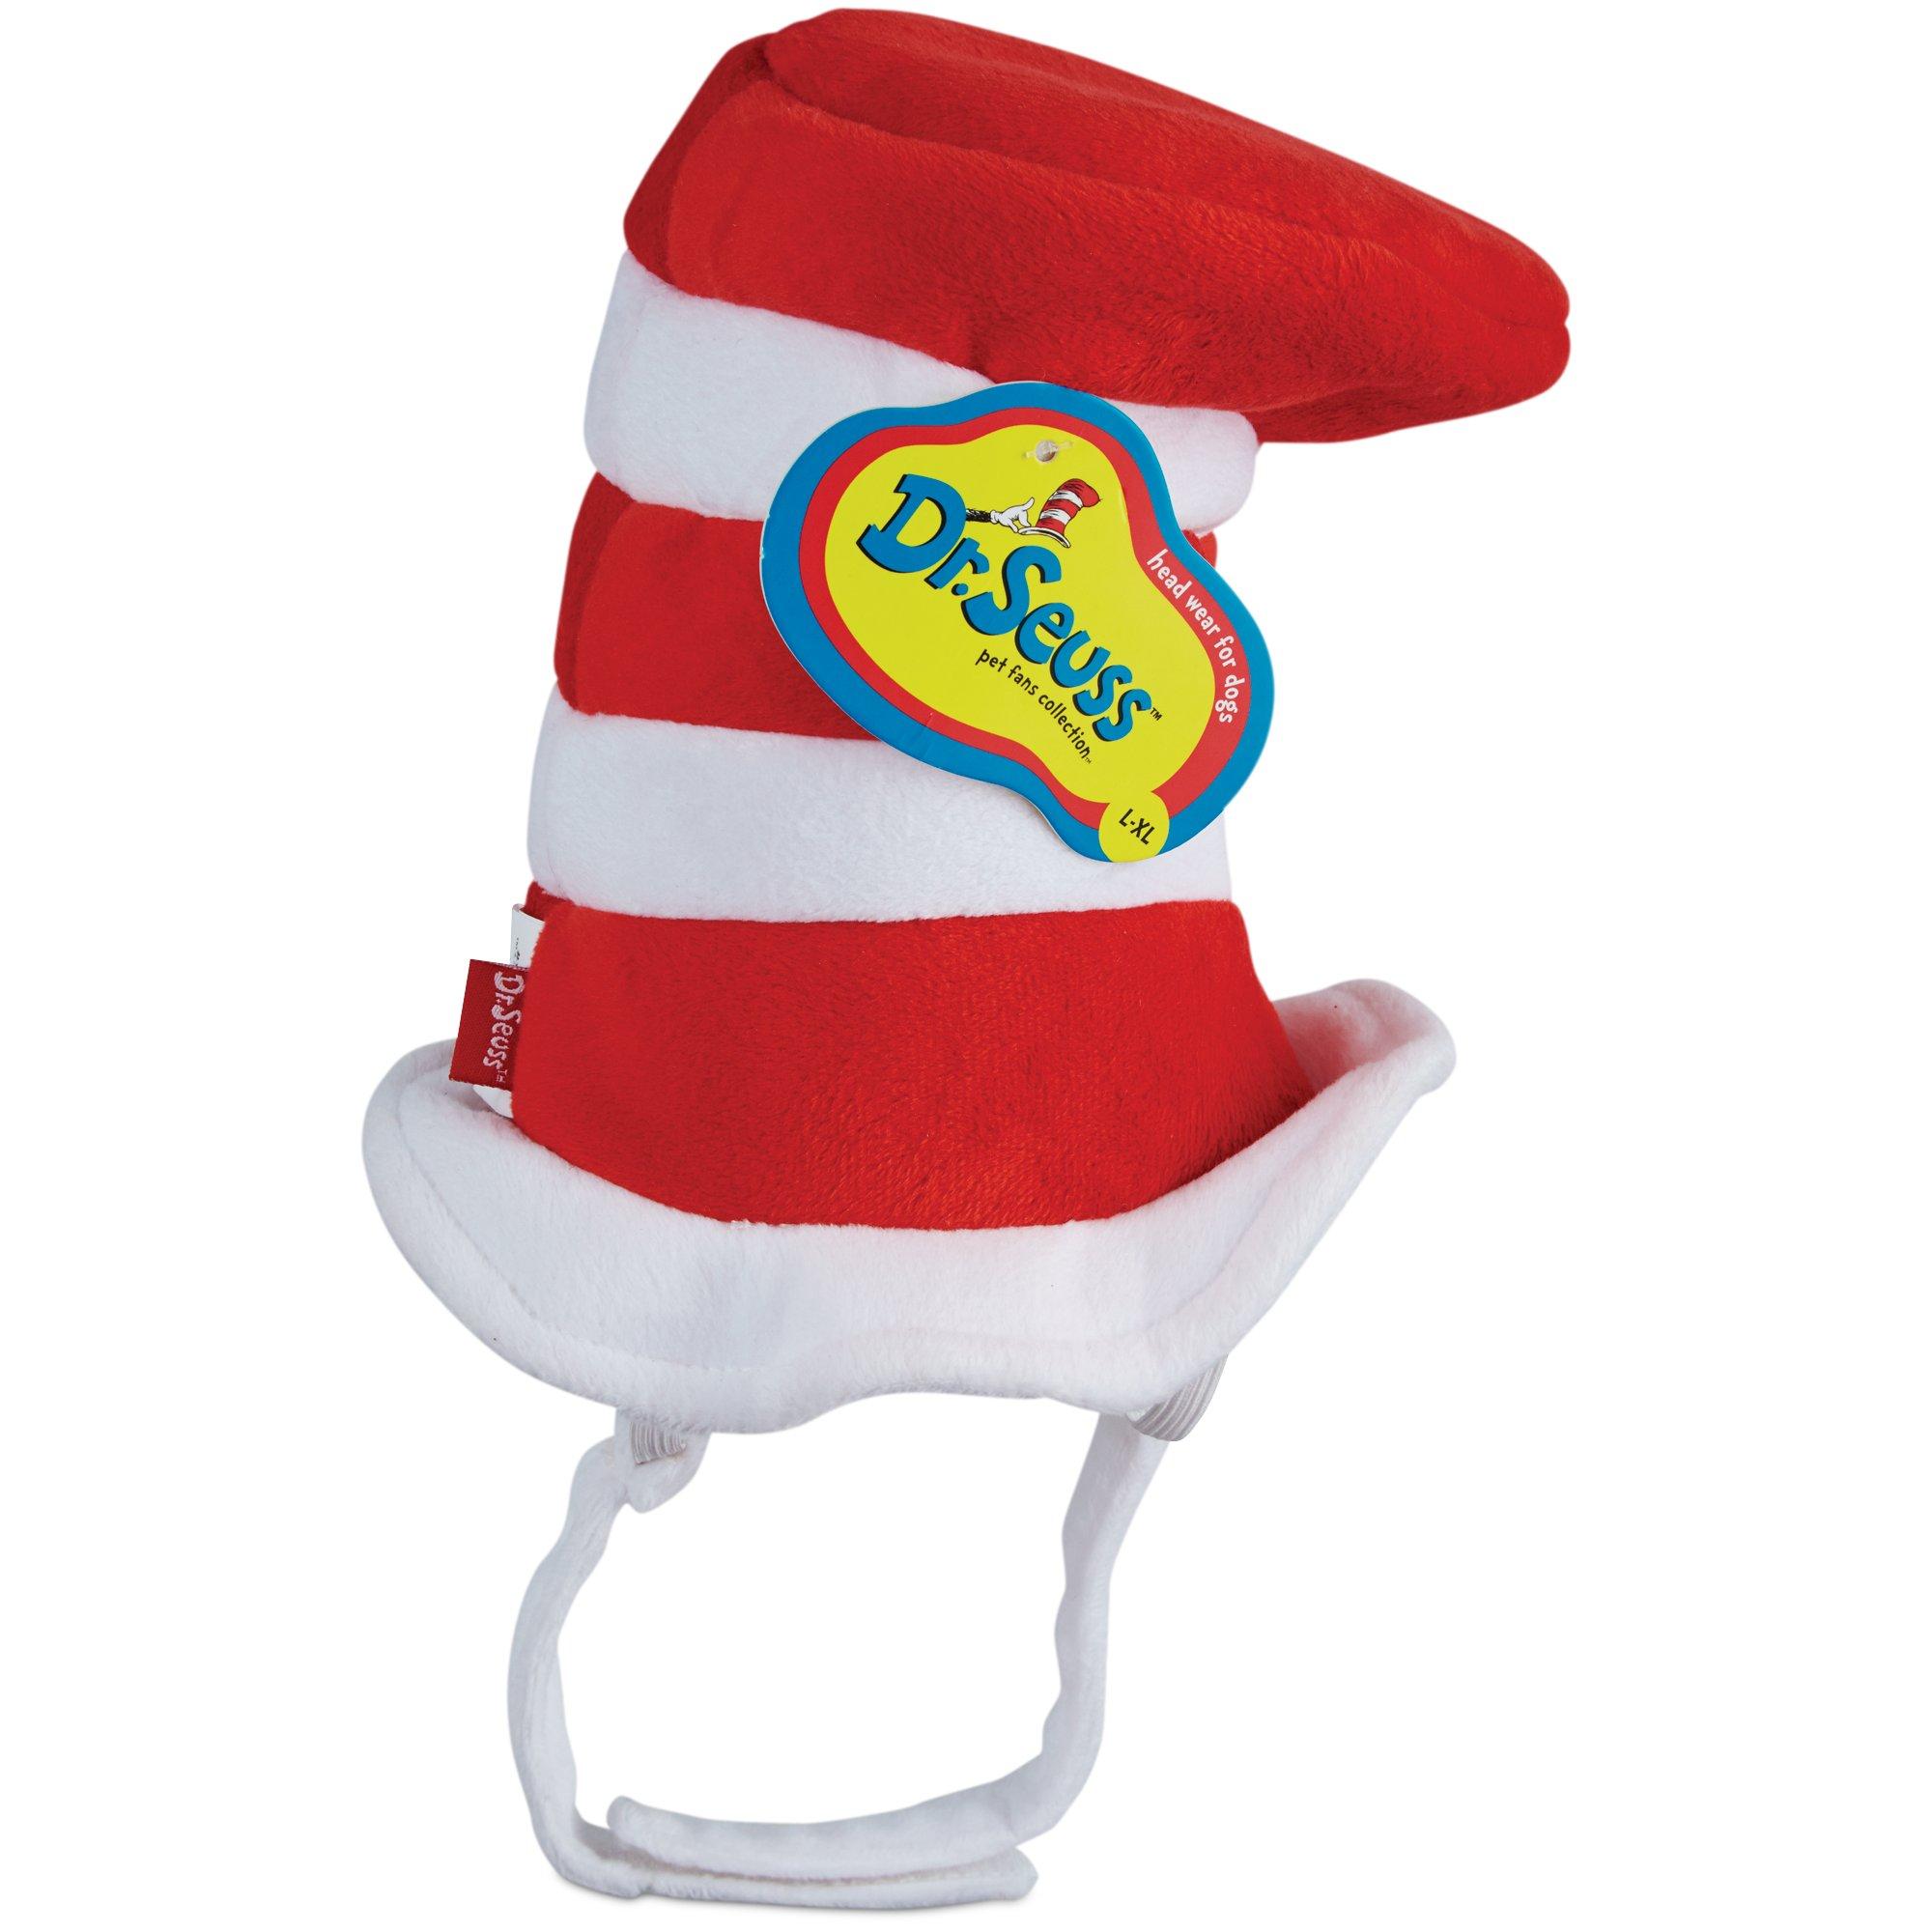 Dr. Seuss Cat in the Hat Head Wear for Dogs